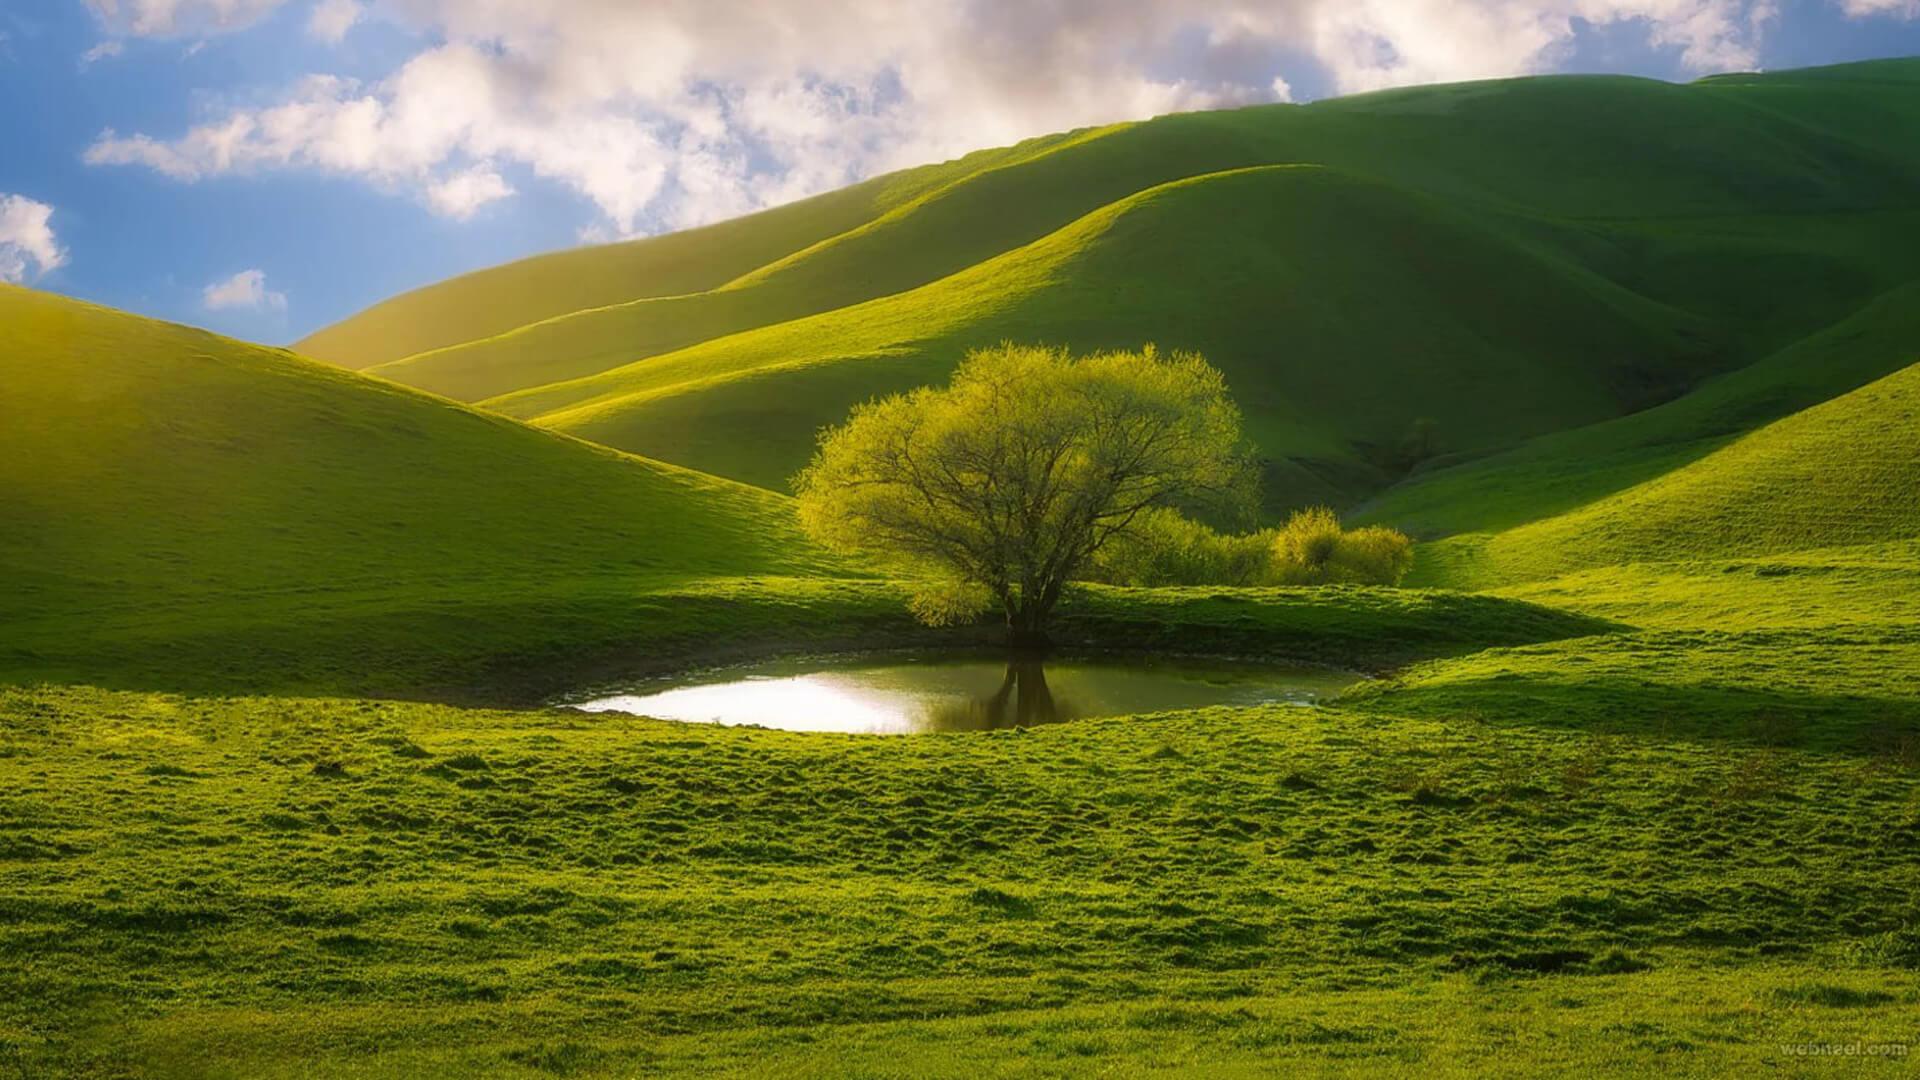 nature wallpaper full hd,green,natural landscape,nature,grassland,highland